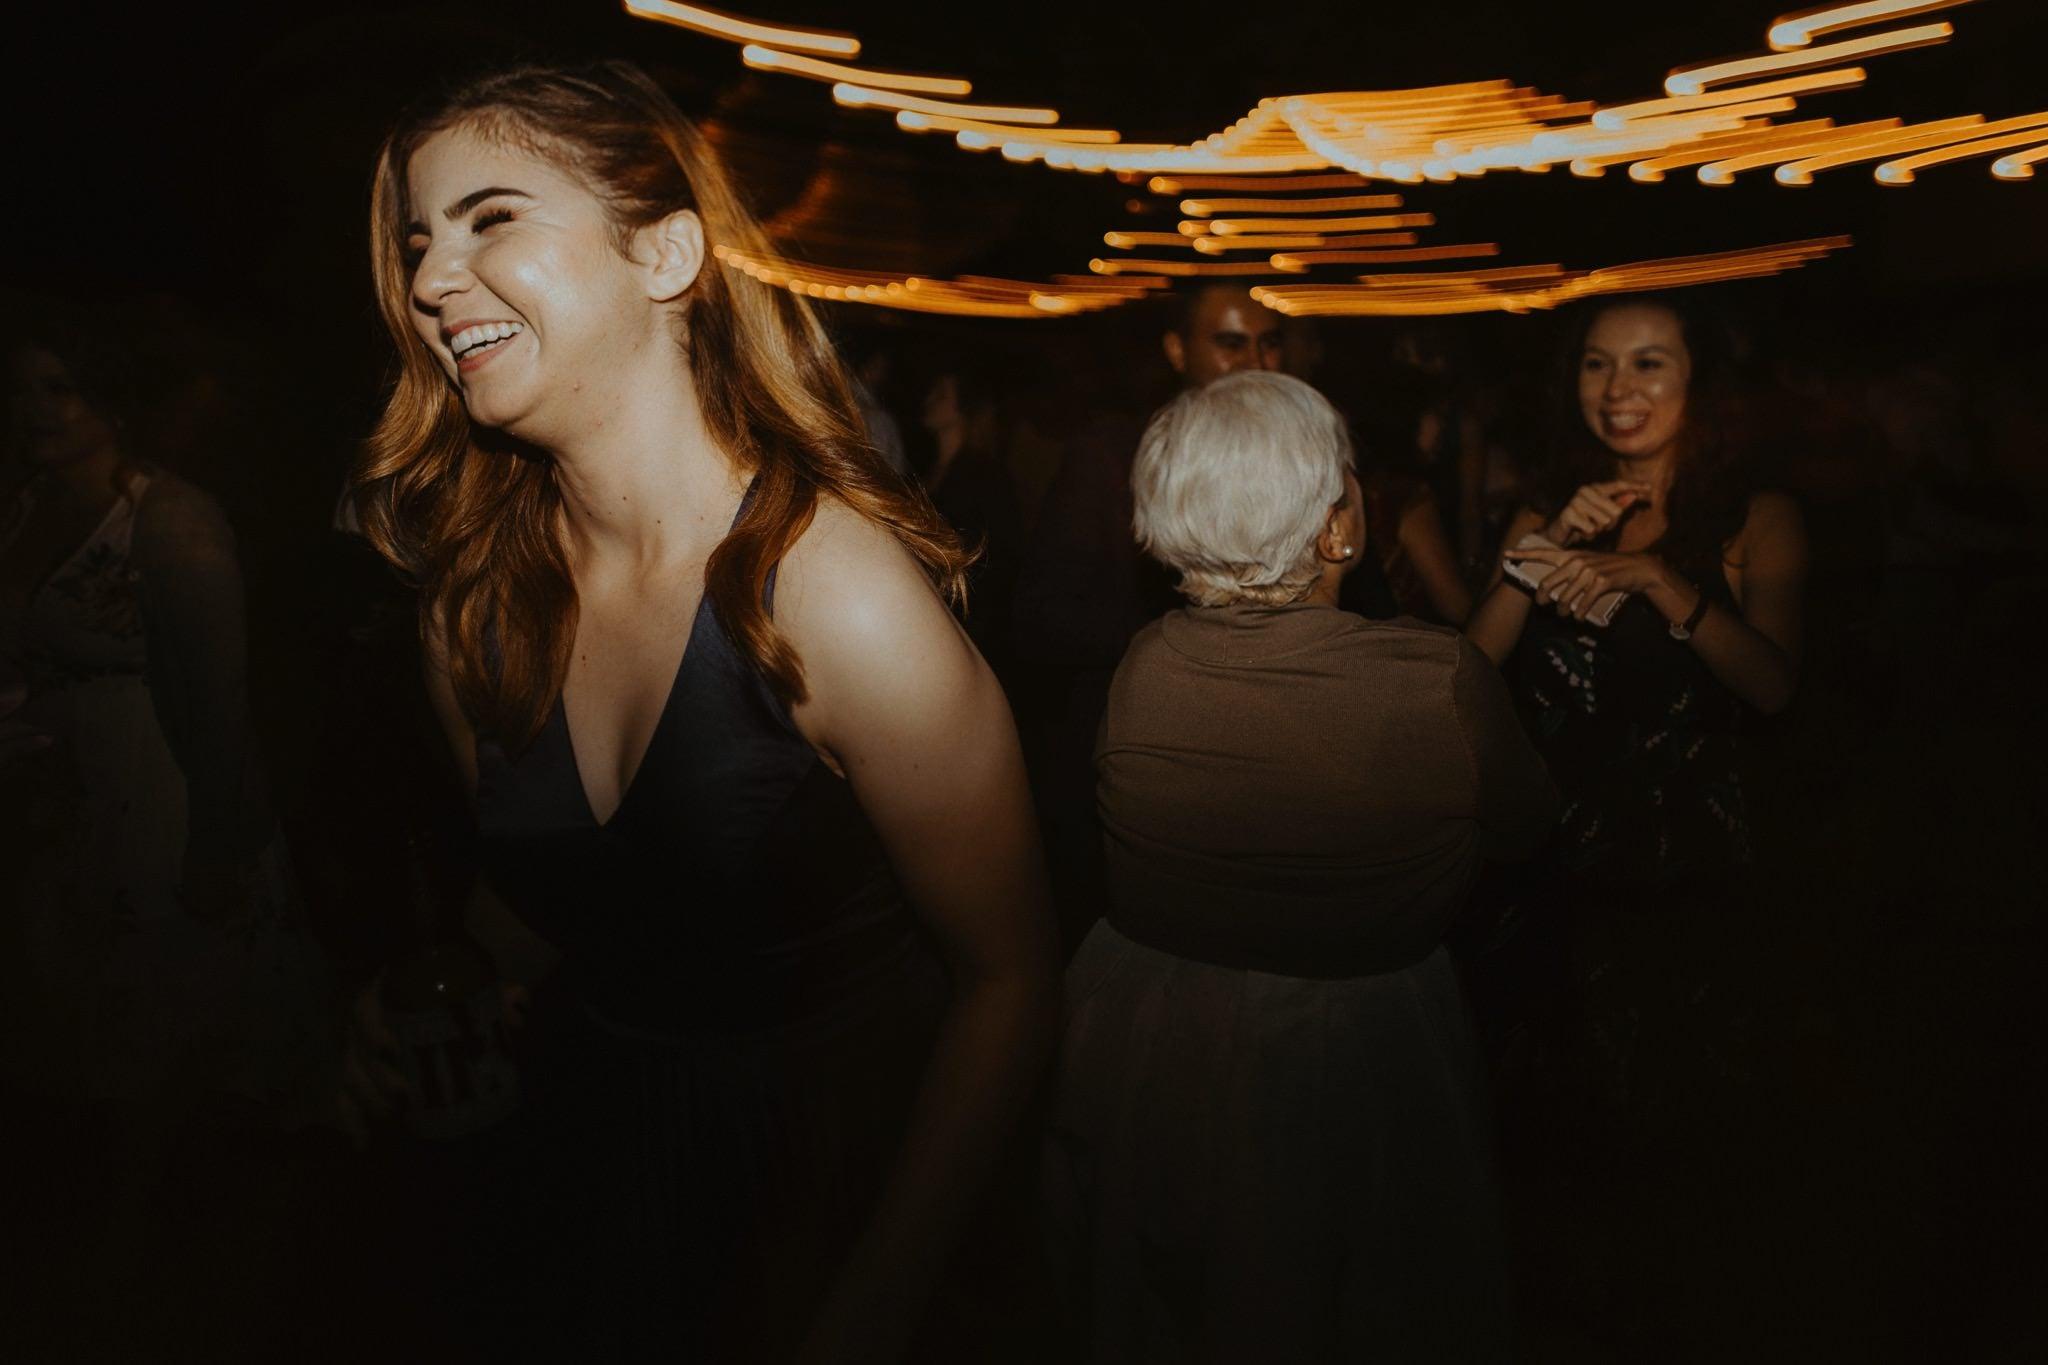 simi valley wedding photography 184